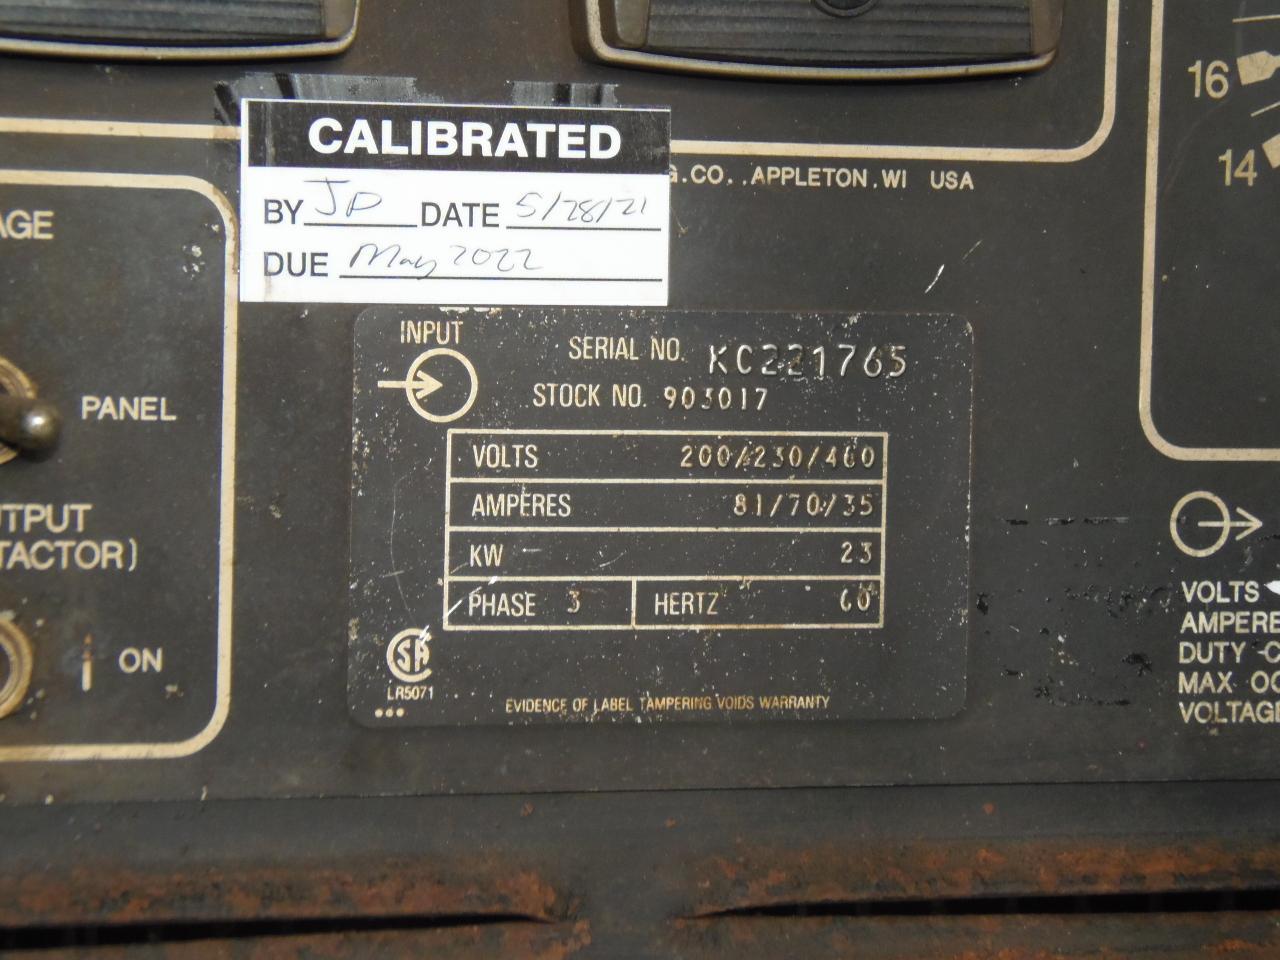 Miller 450 Amp Wire Feed Welder, Model Deltaweld 451 with D64 feeder